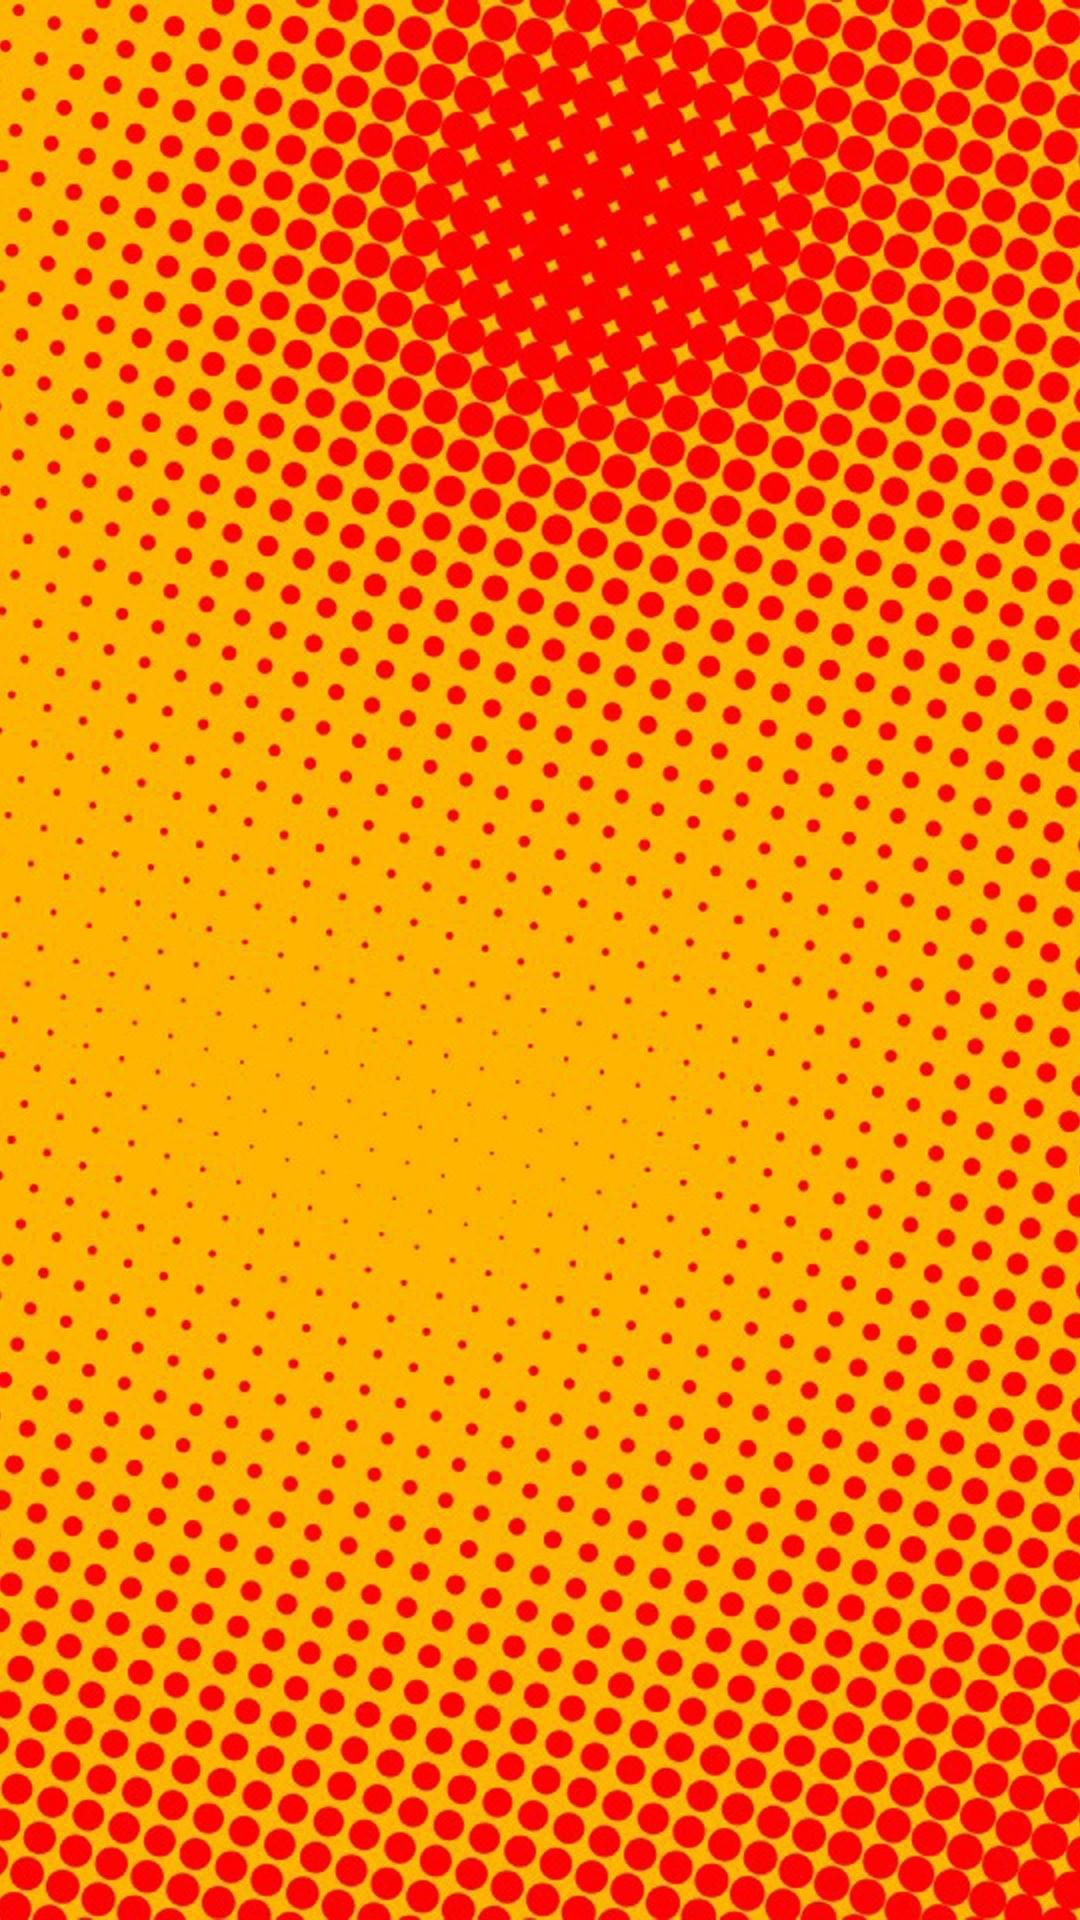 Orange hd wallpaper for mobile